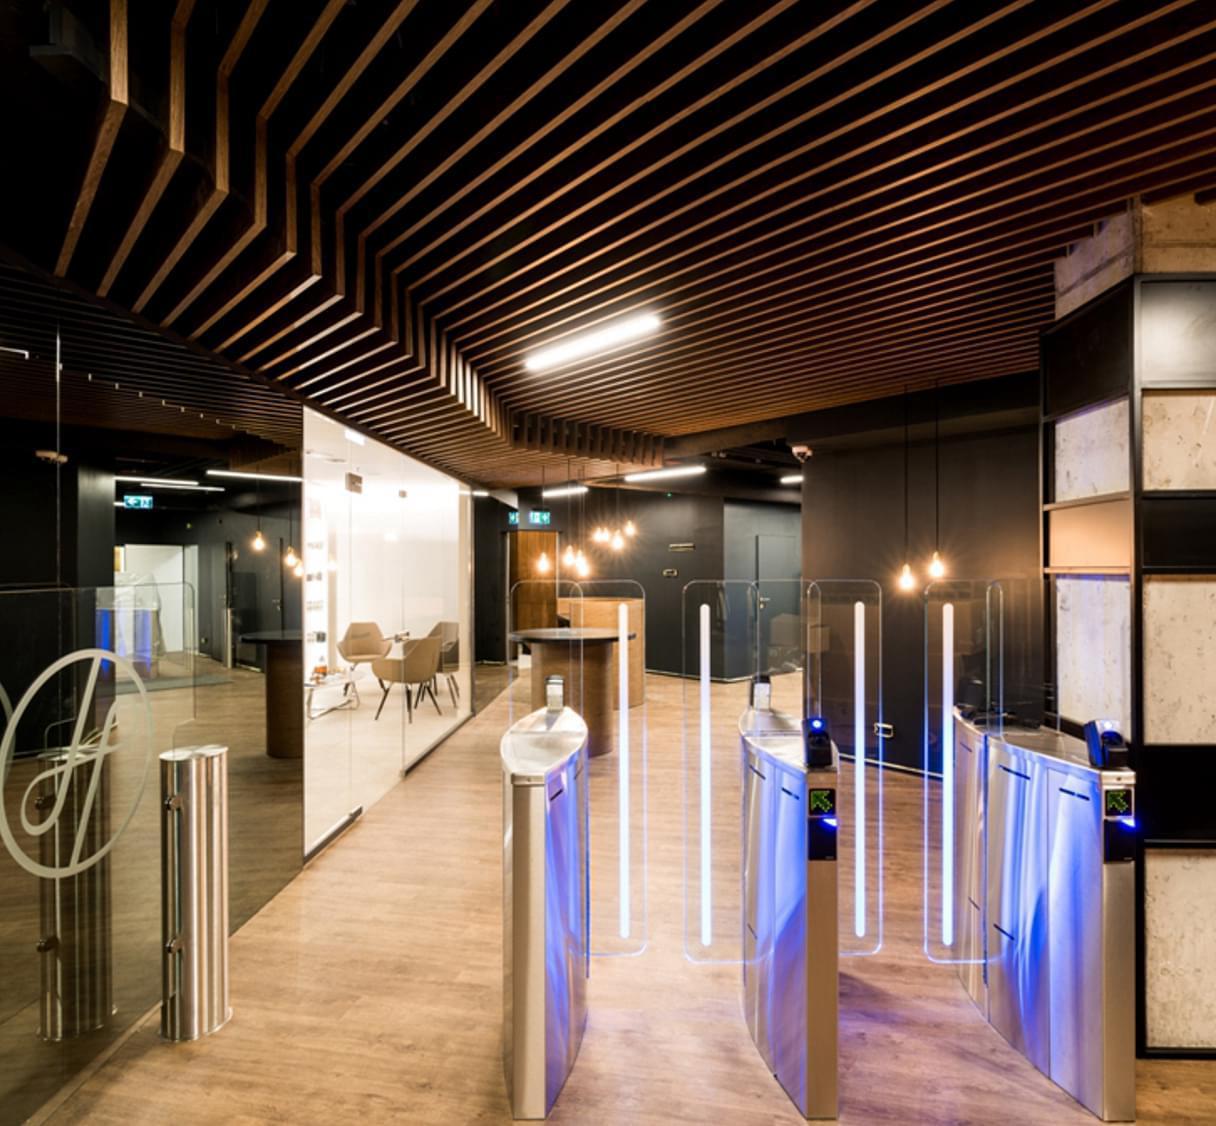 Holmes Place Poland | Premium OVO Wrocław | Entrance